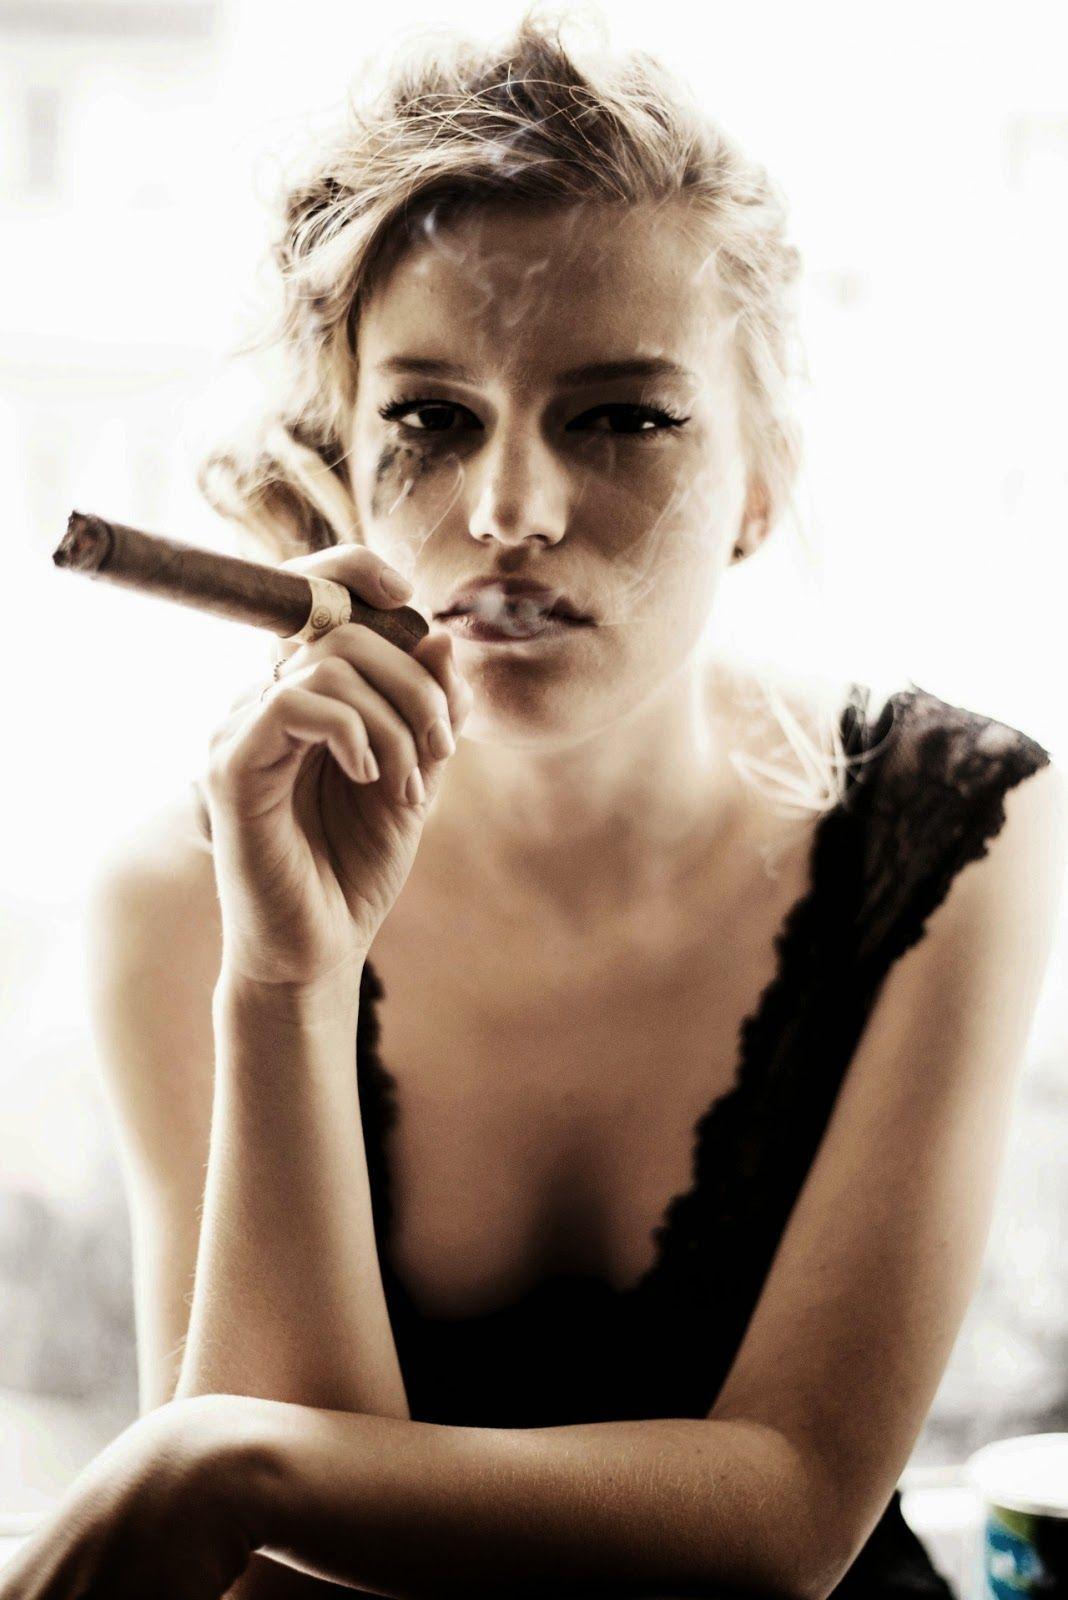 Famous women cigar smokers, ten hot naked girls